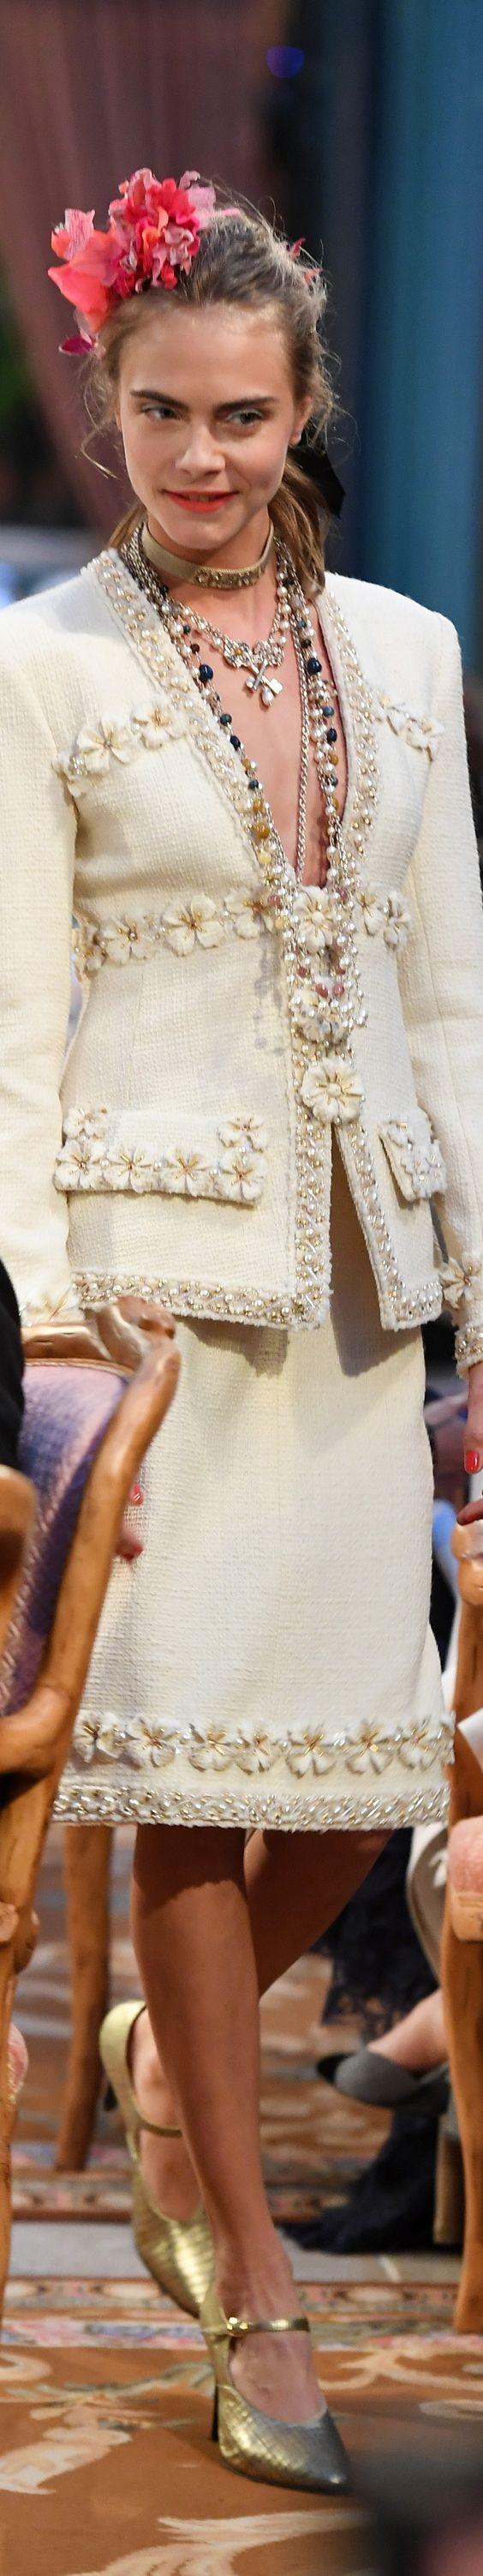 Chanel Pre-Fall 2017 Fashion Show & more details